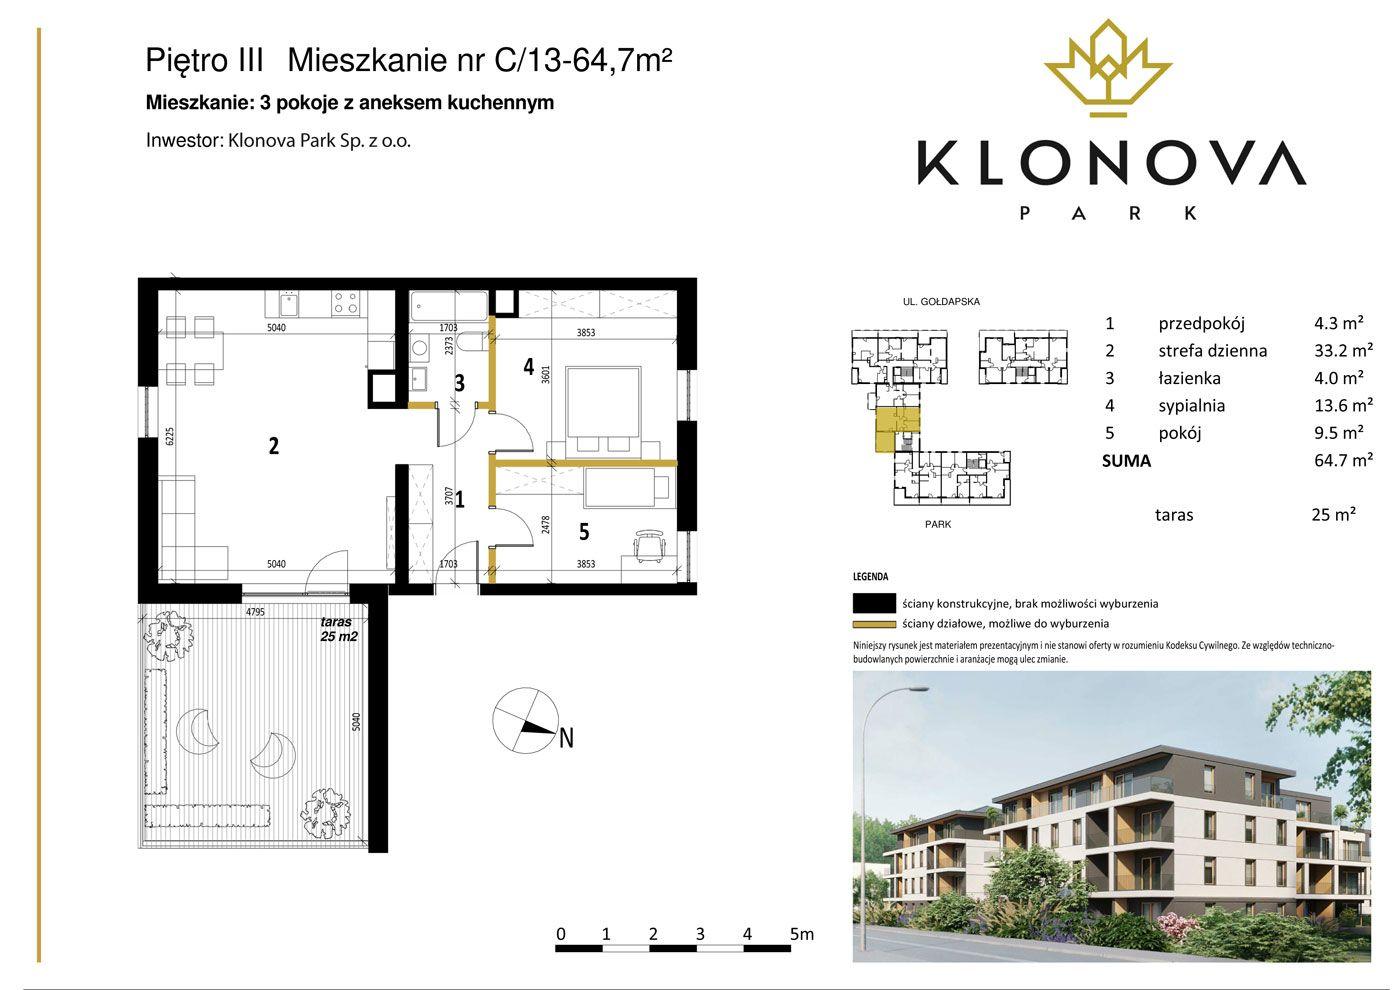 Apartamenty Klonova Park - Plan mieszkania C/13